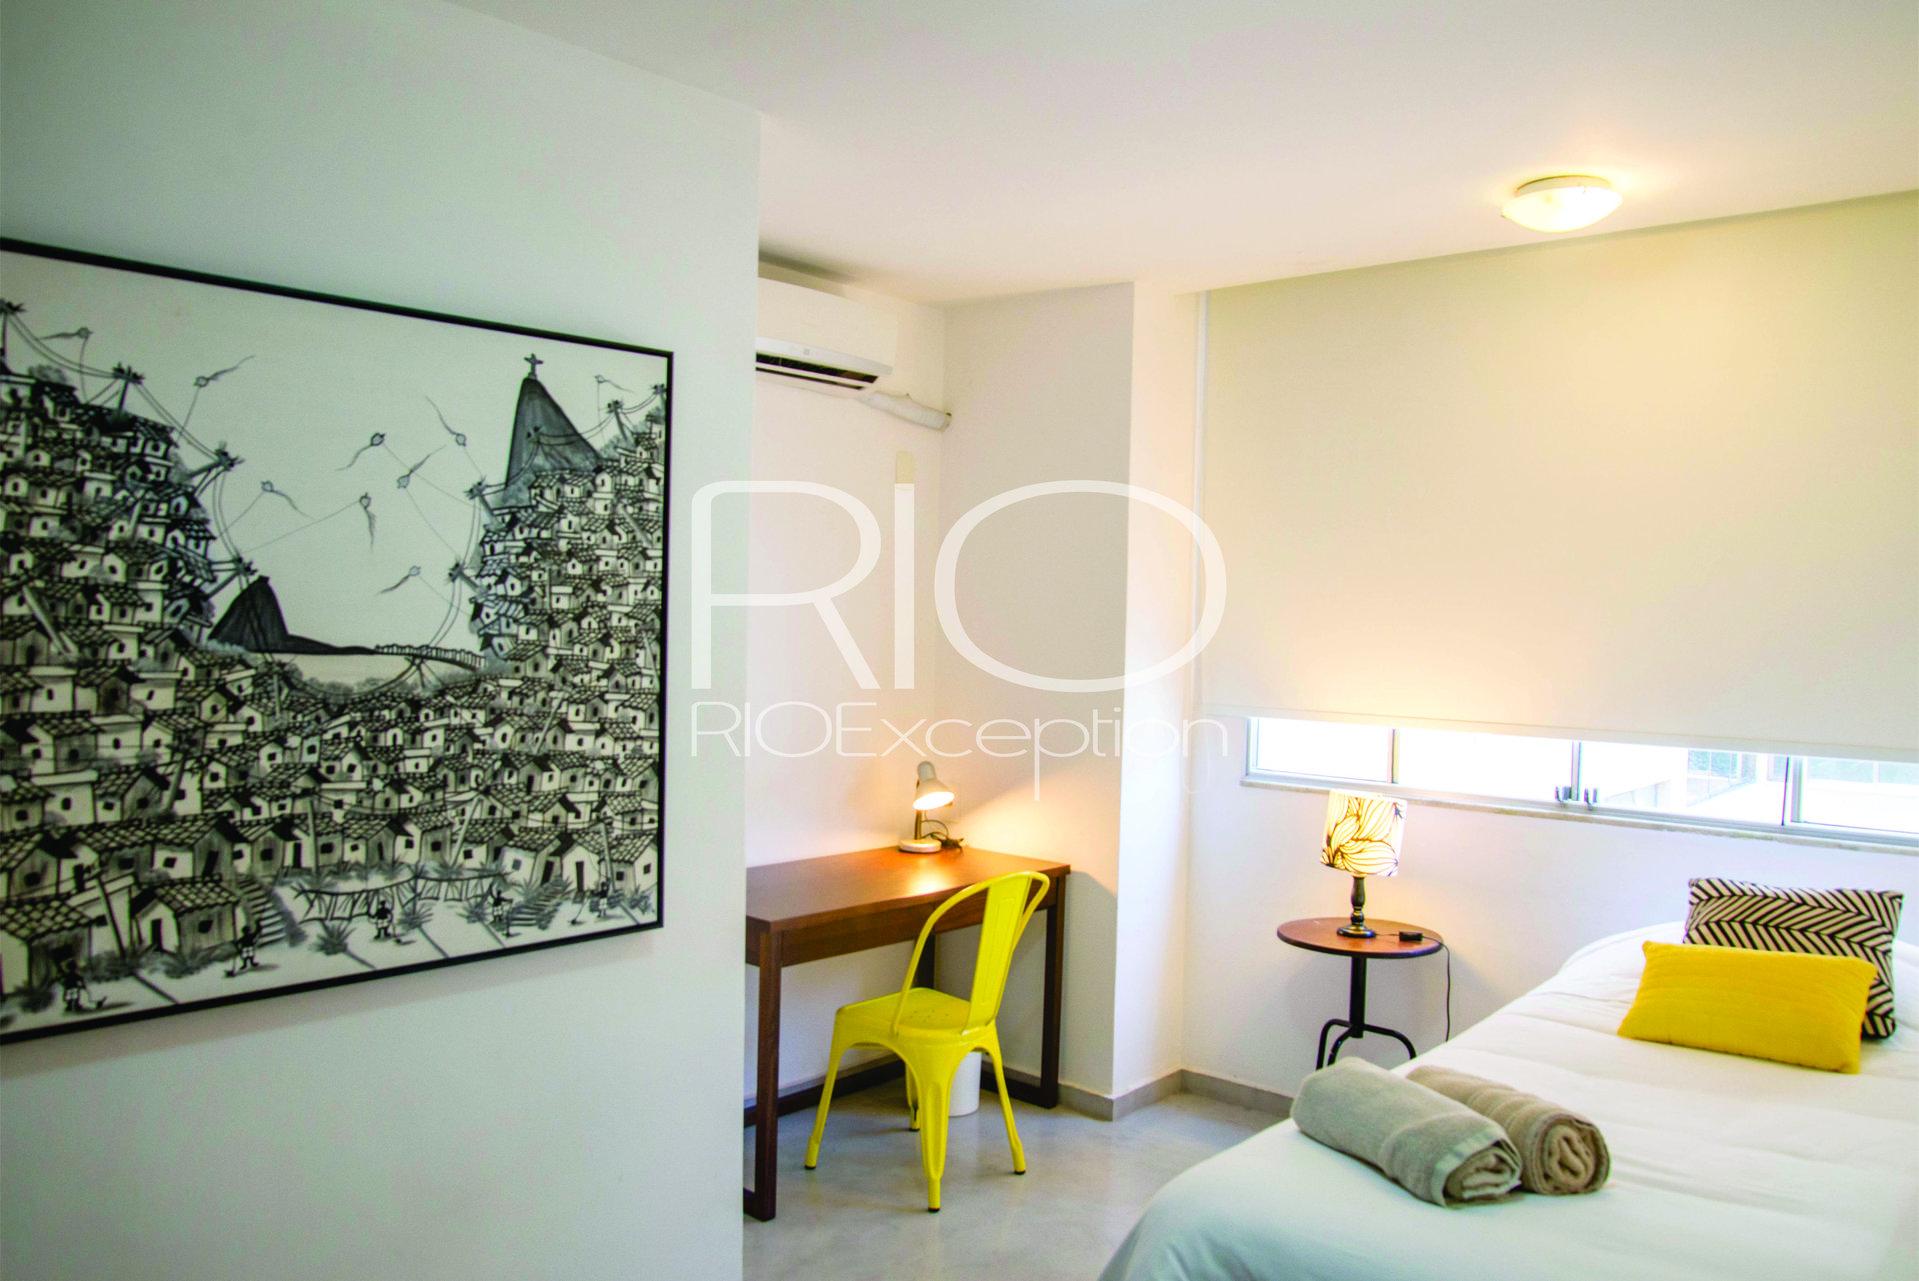 COPACABANA - Avenida Atlântica posto 6 - Apartamento 200 m2.